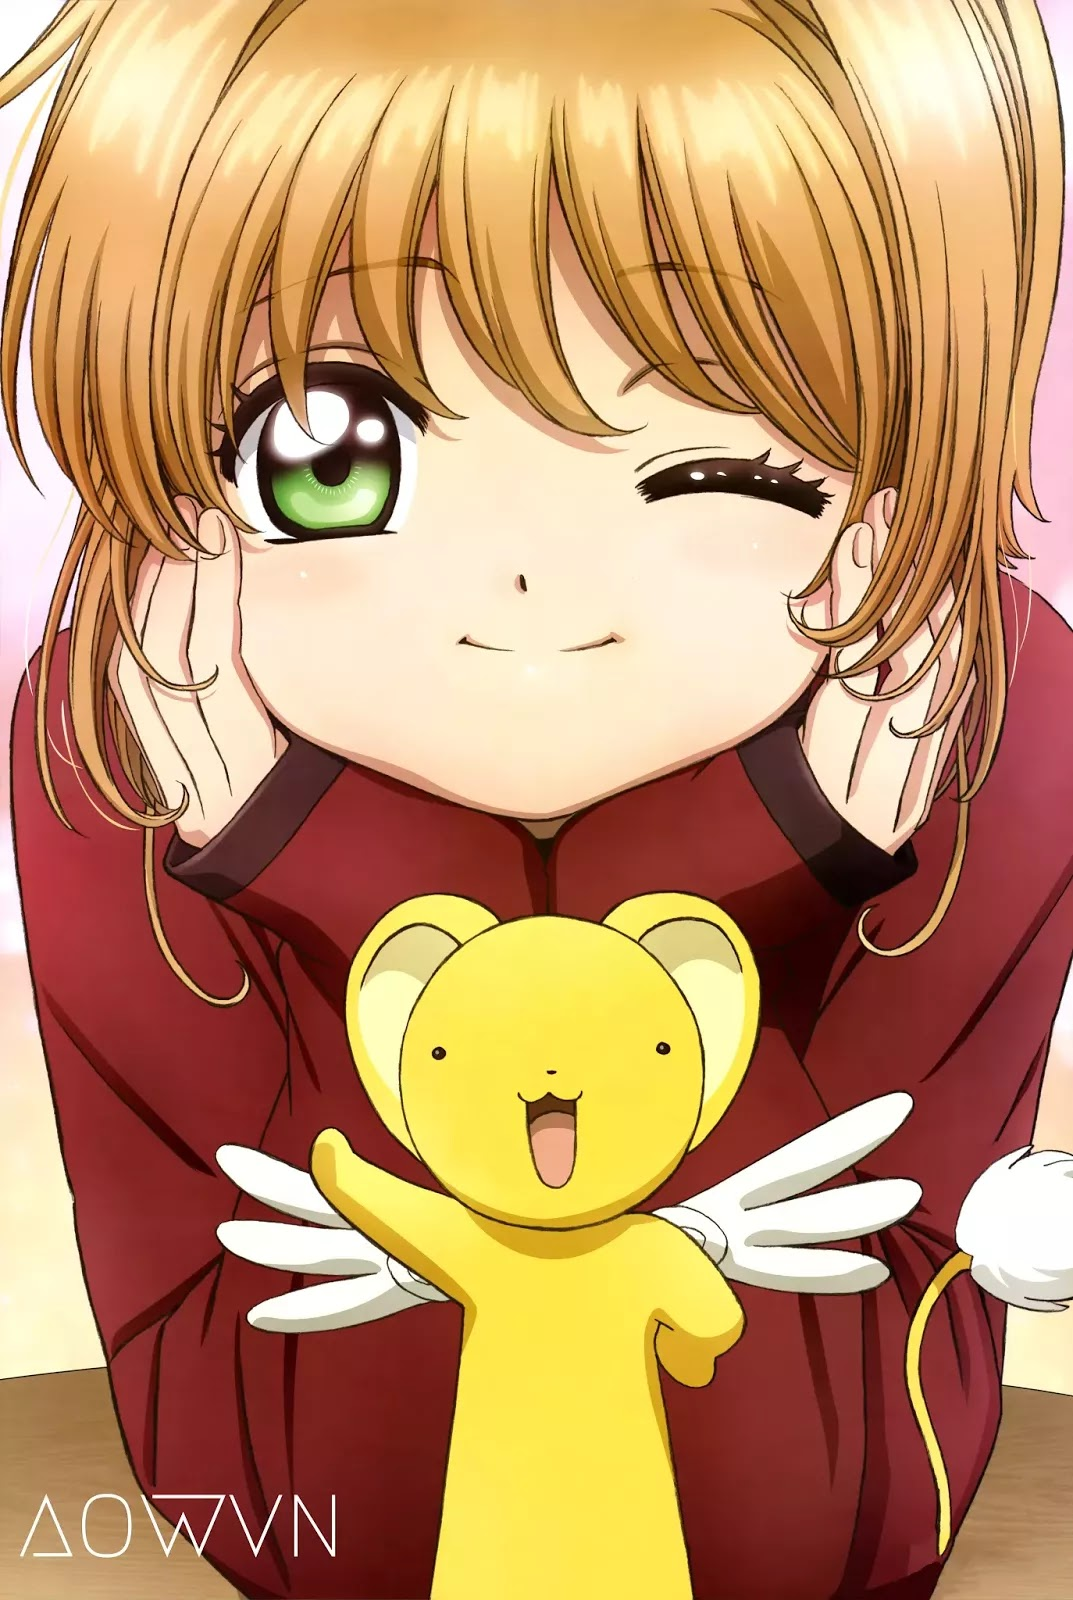 Sakura AowVN%2B%25281%2529 - [ Anime 3gp Mp4 | Ep 22 ] Cardcaptor Sakura: Clear Card-hen | Vietsub - Tuổi Thơ Trở Về